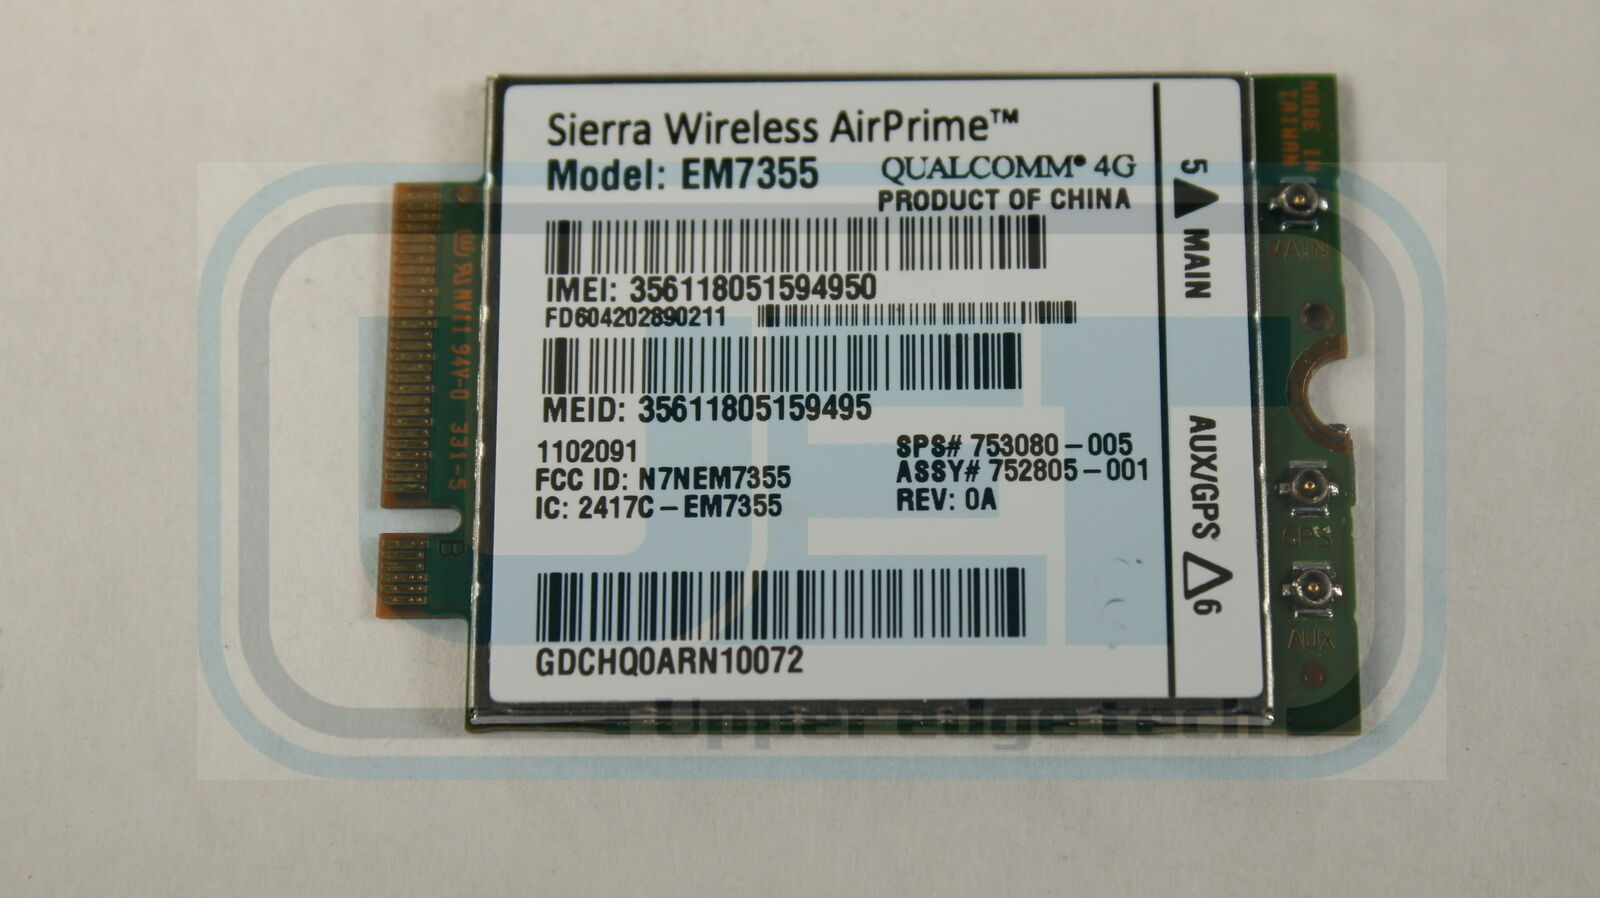 HP Elitebook Revolve 810 G2 Cellular Card 753080-005 WWAN M.2 Tested Warranty